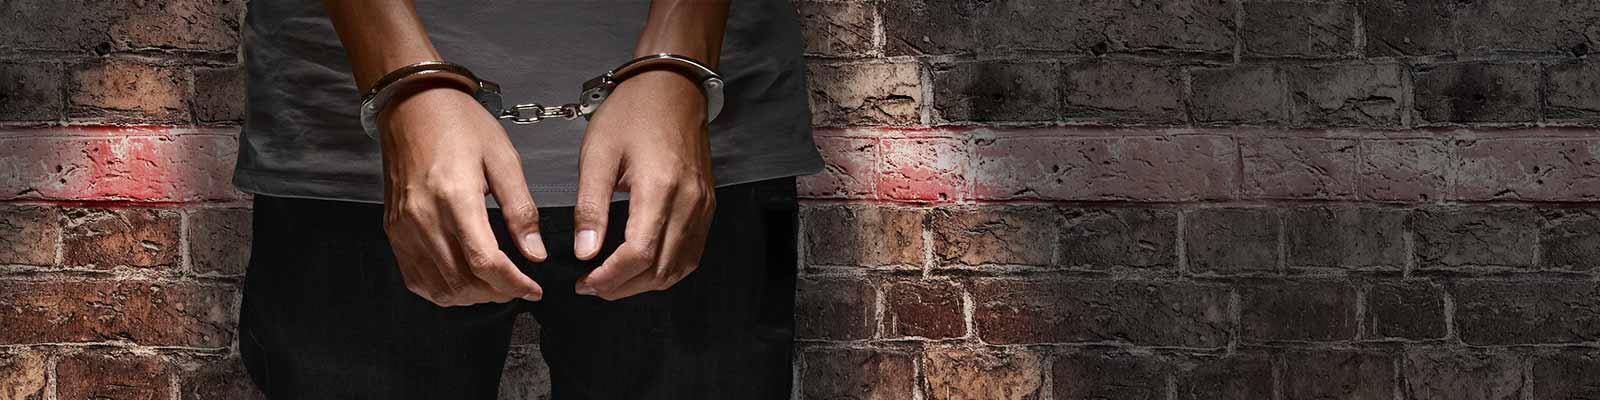 DWI Jail Release